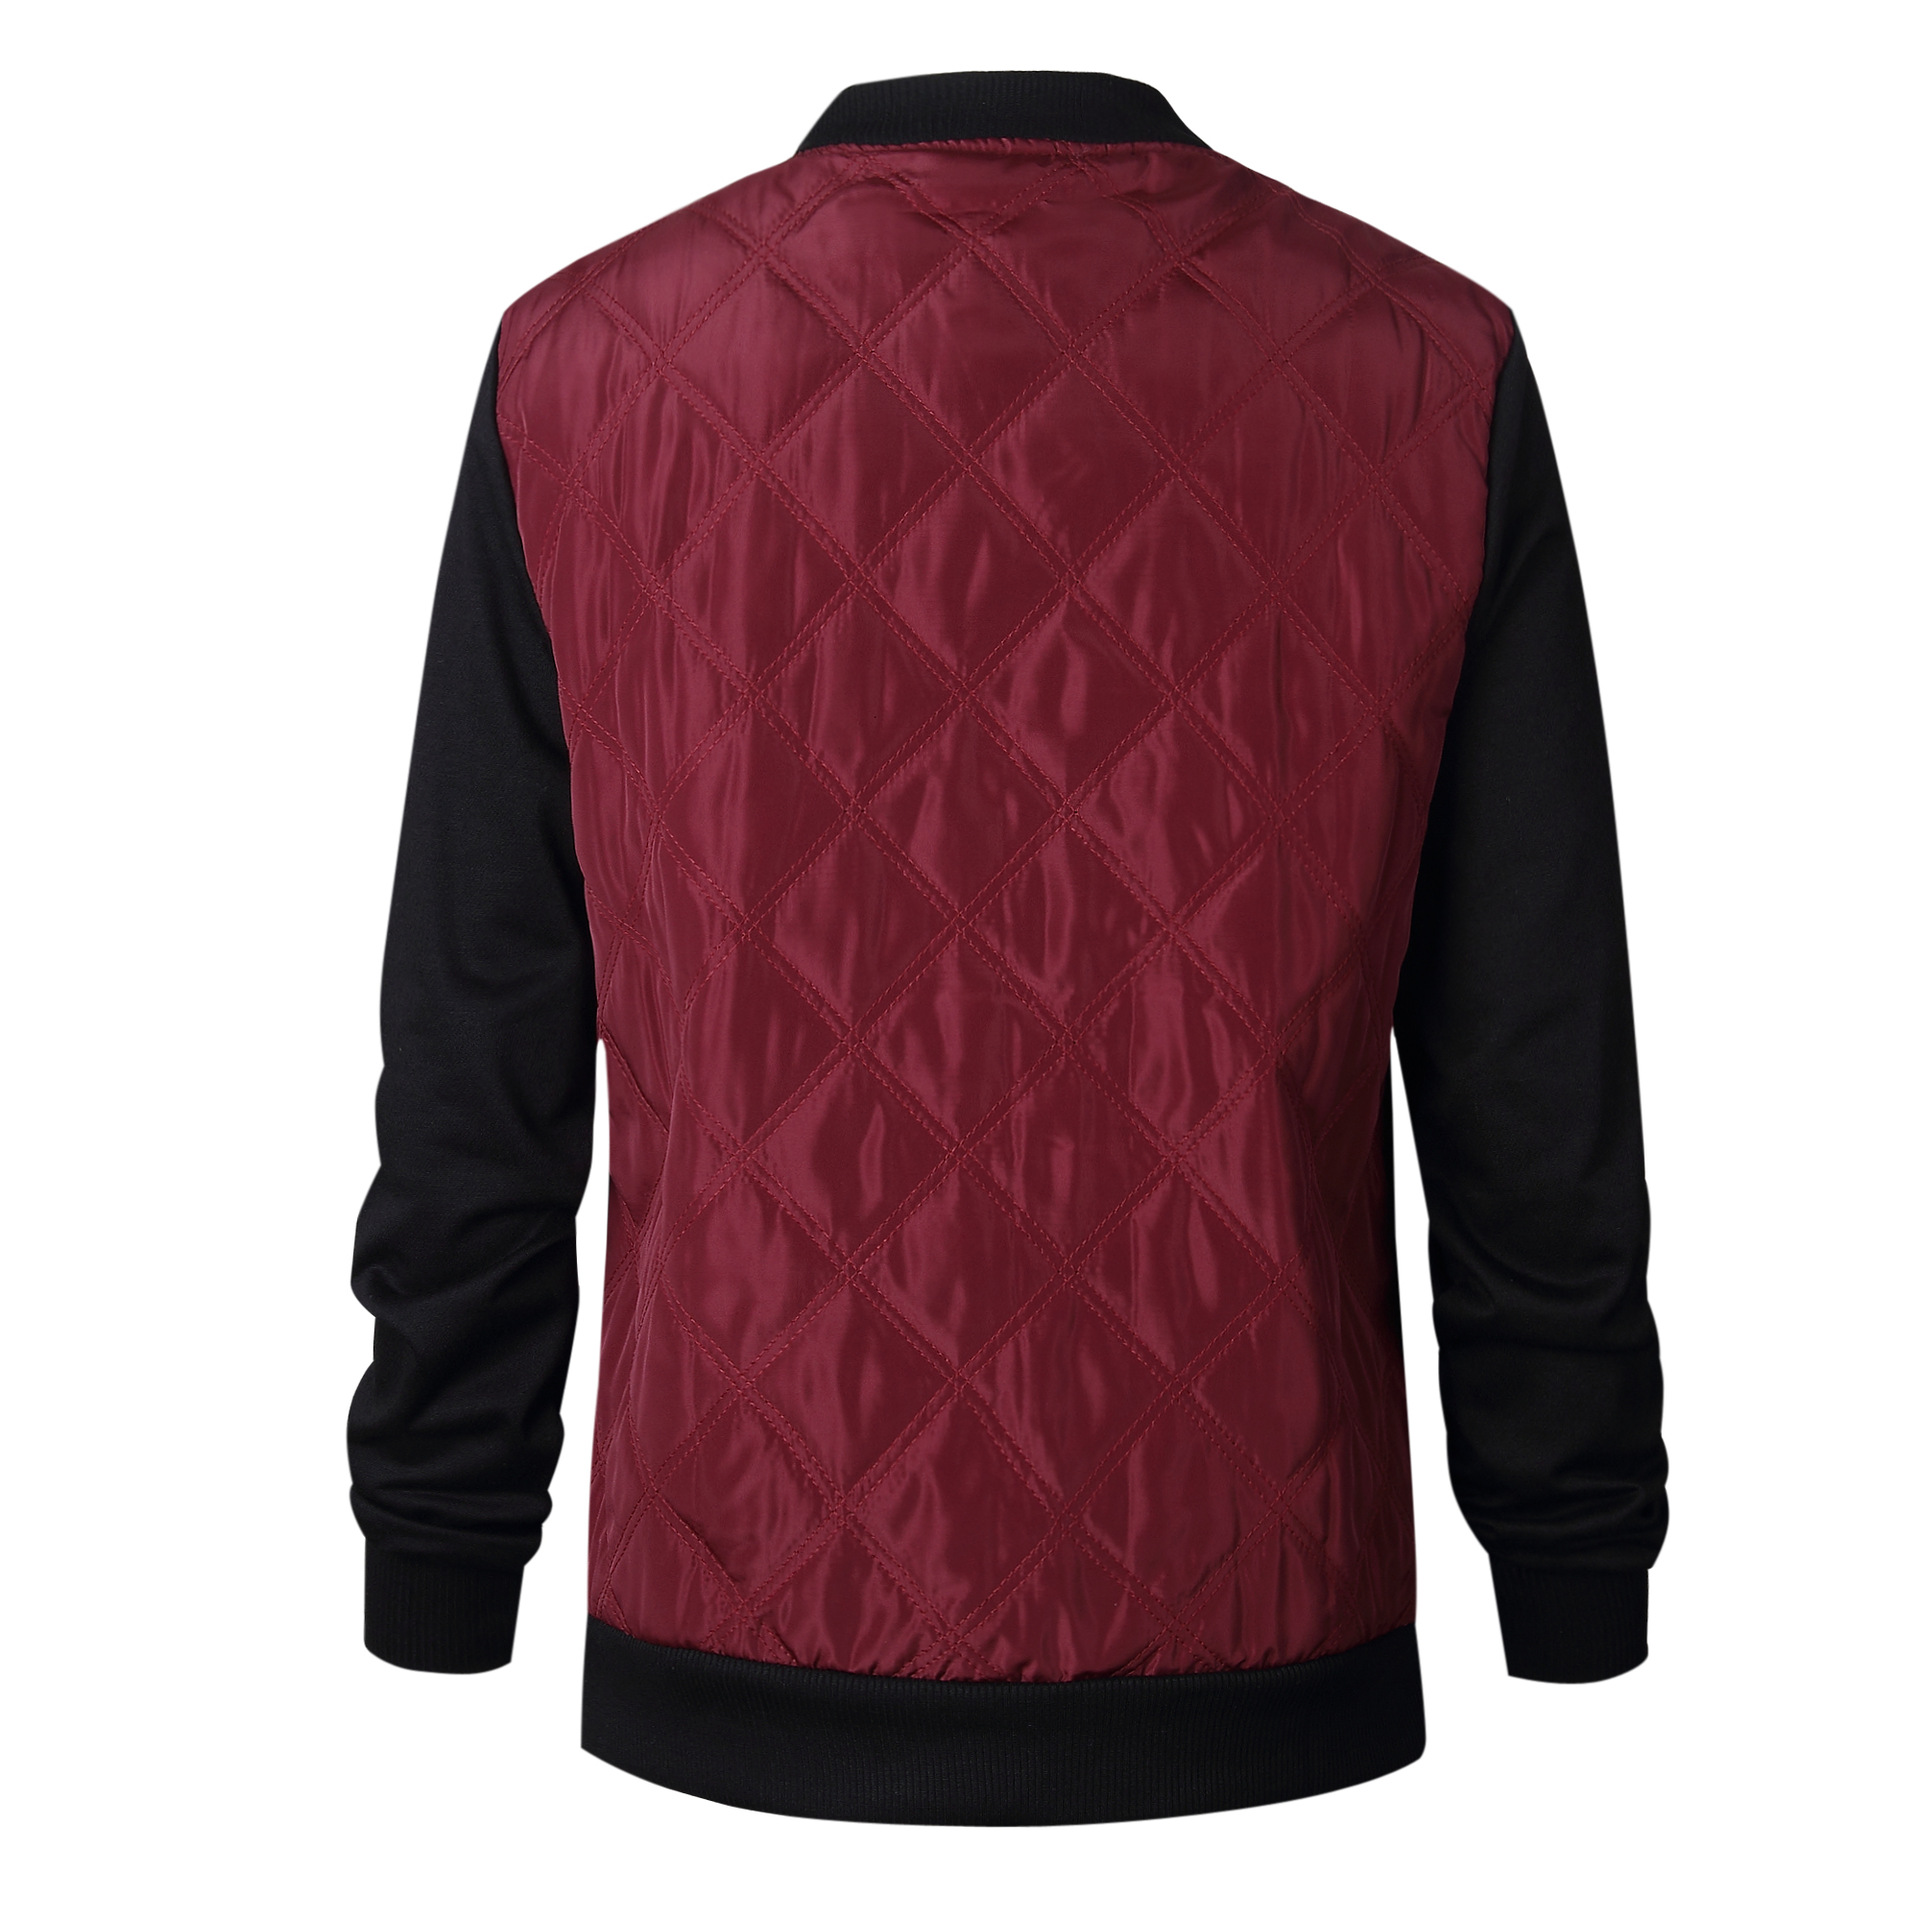 HTB1h9bWFkyWBuNjy0Fpq6yssXXa8 Plus Size Autumn Winter Fashion Slim Women's Jacket Zipper Cardigan Splice Bomber Jackets 2019 Long Sleeve Bodycon Coats Female